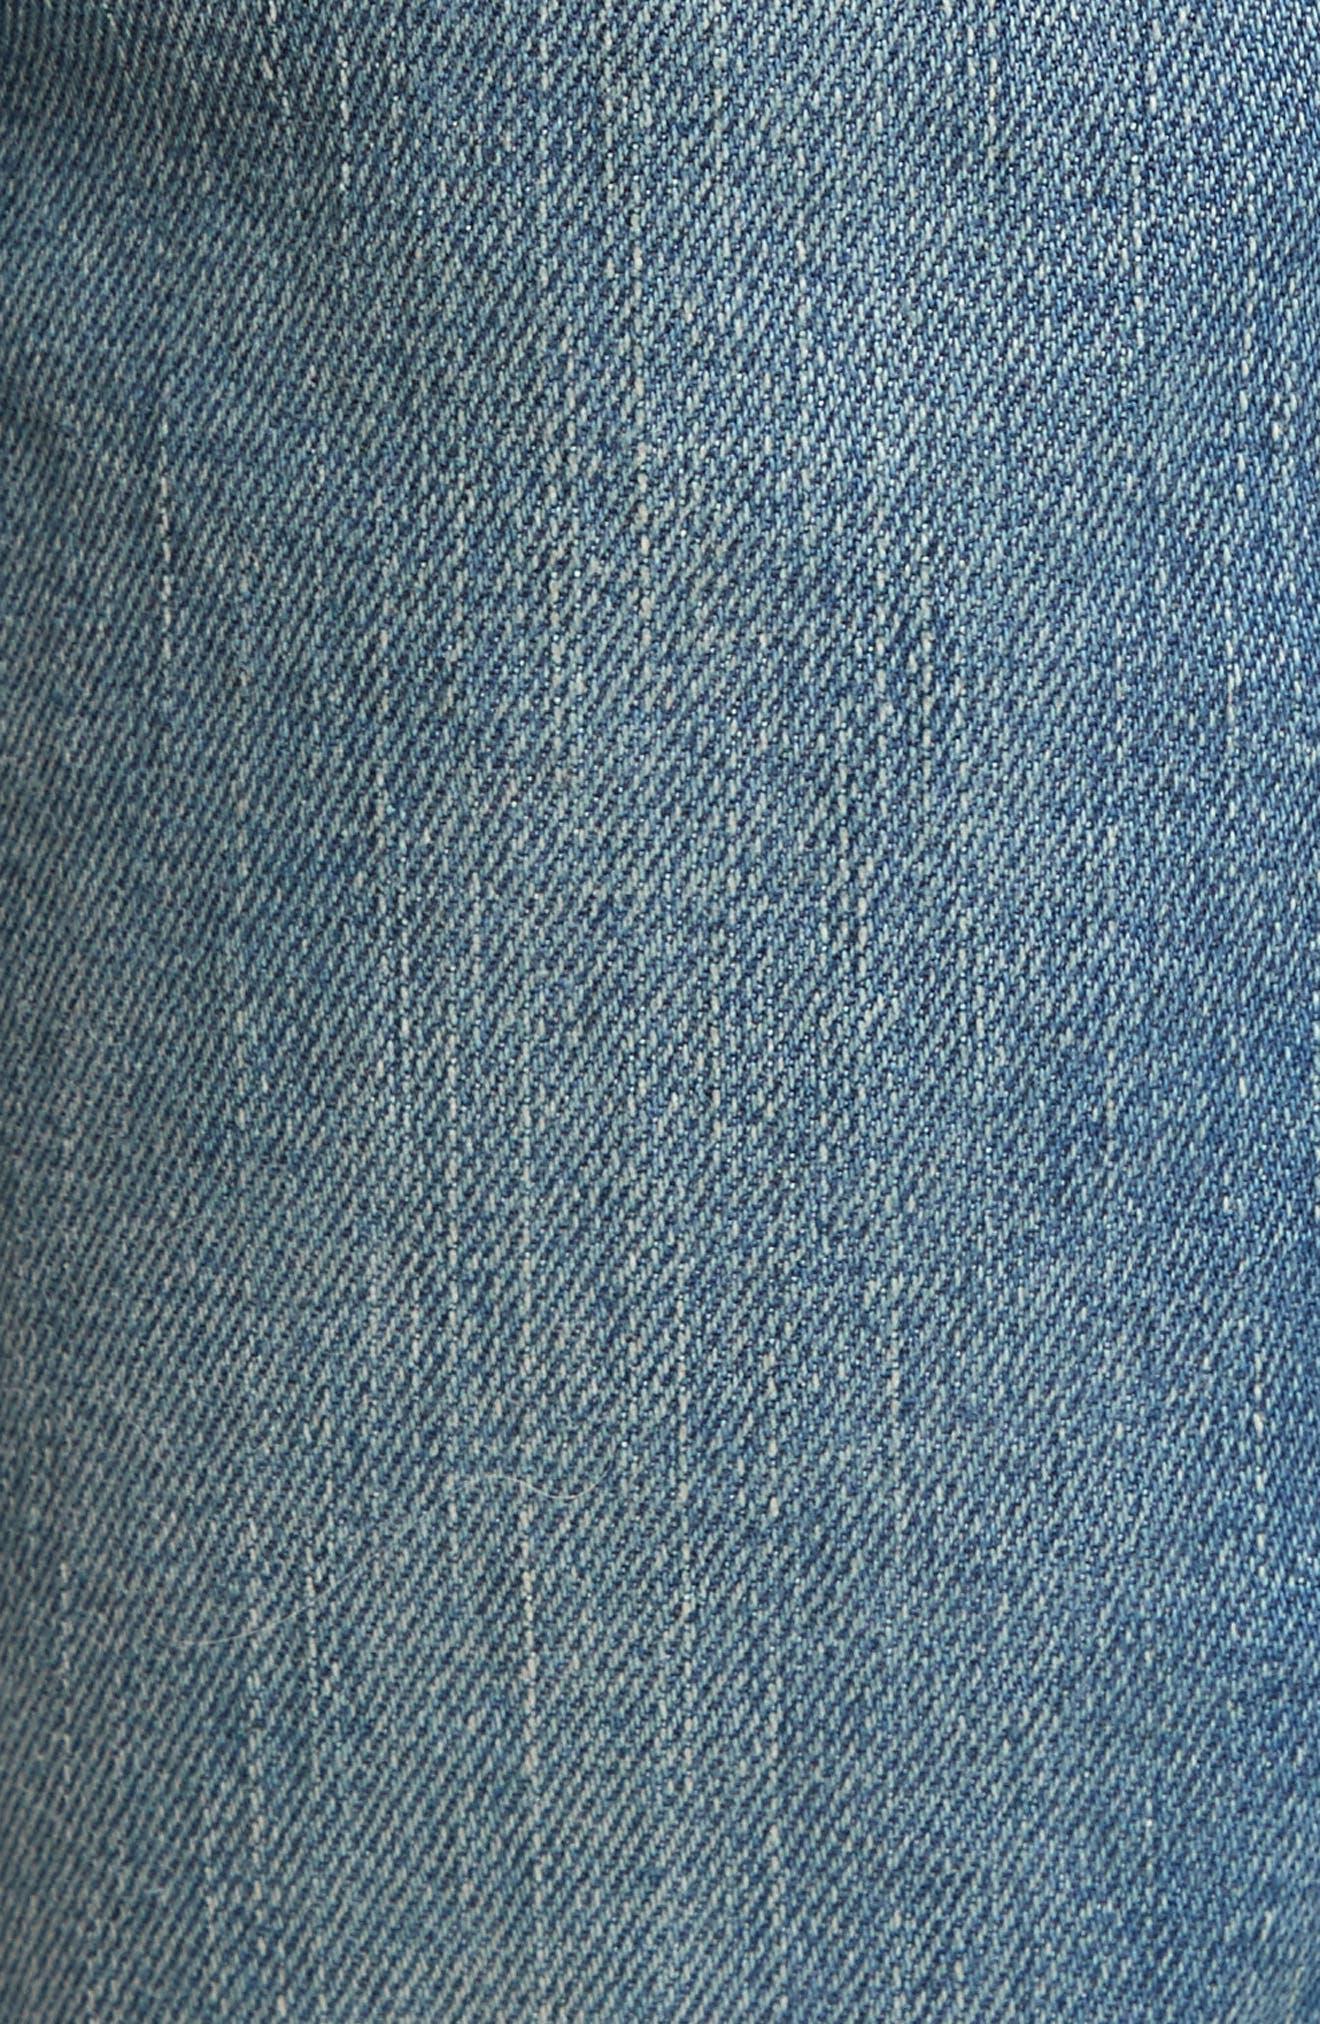 Zip Detail Biker Jeans,                             Alternate thumbnail 5, color,                             Light Blue